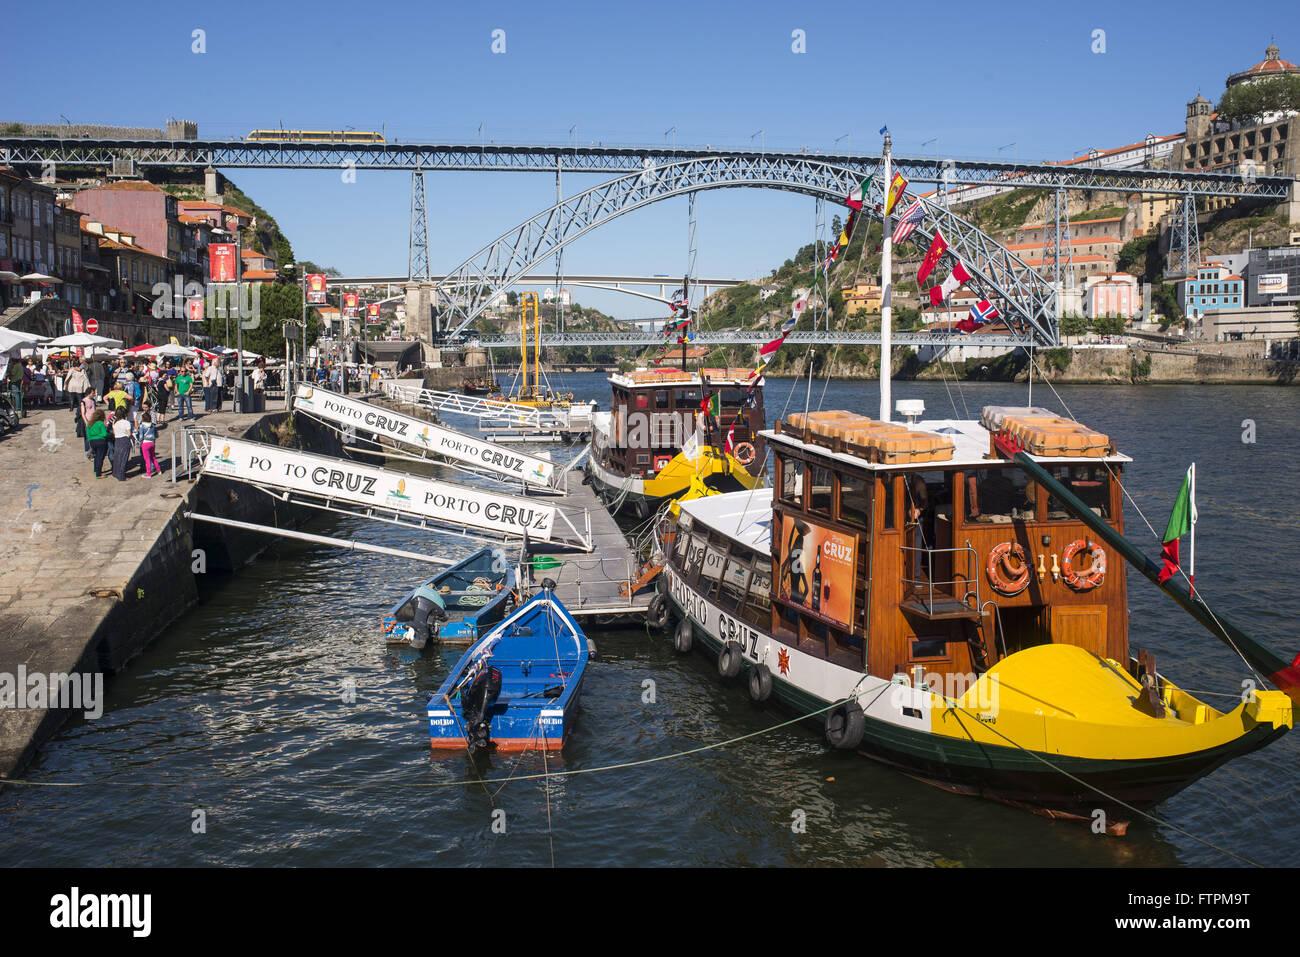 Boat ride on the Douro River - historic city center - Stock Image